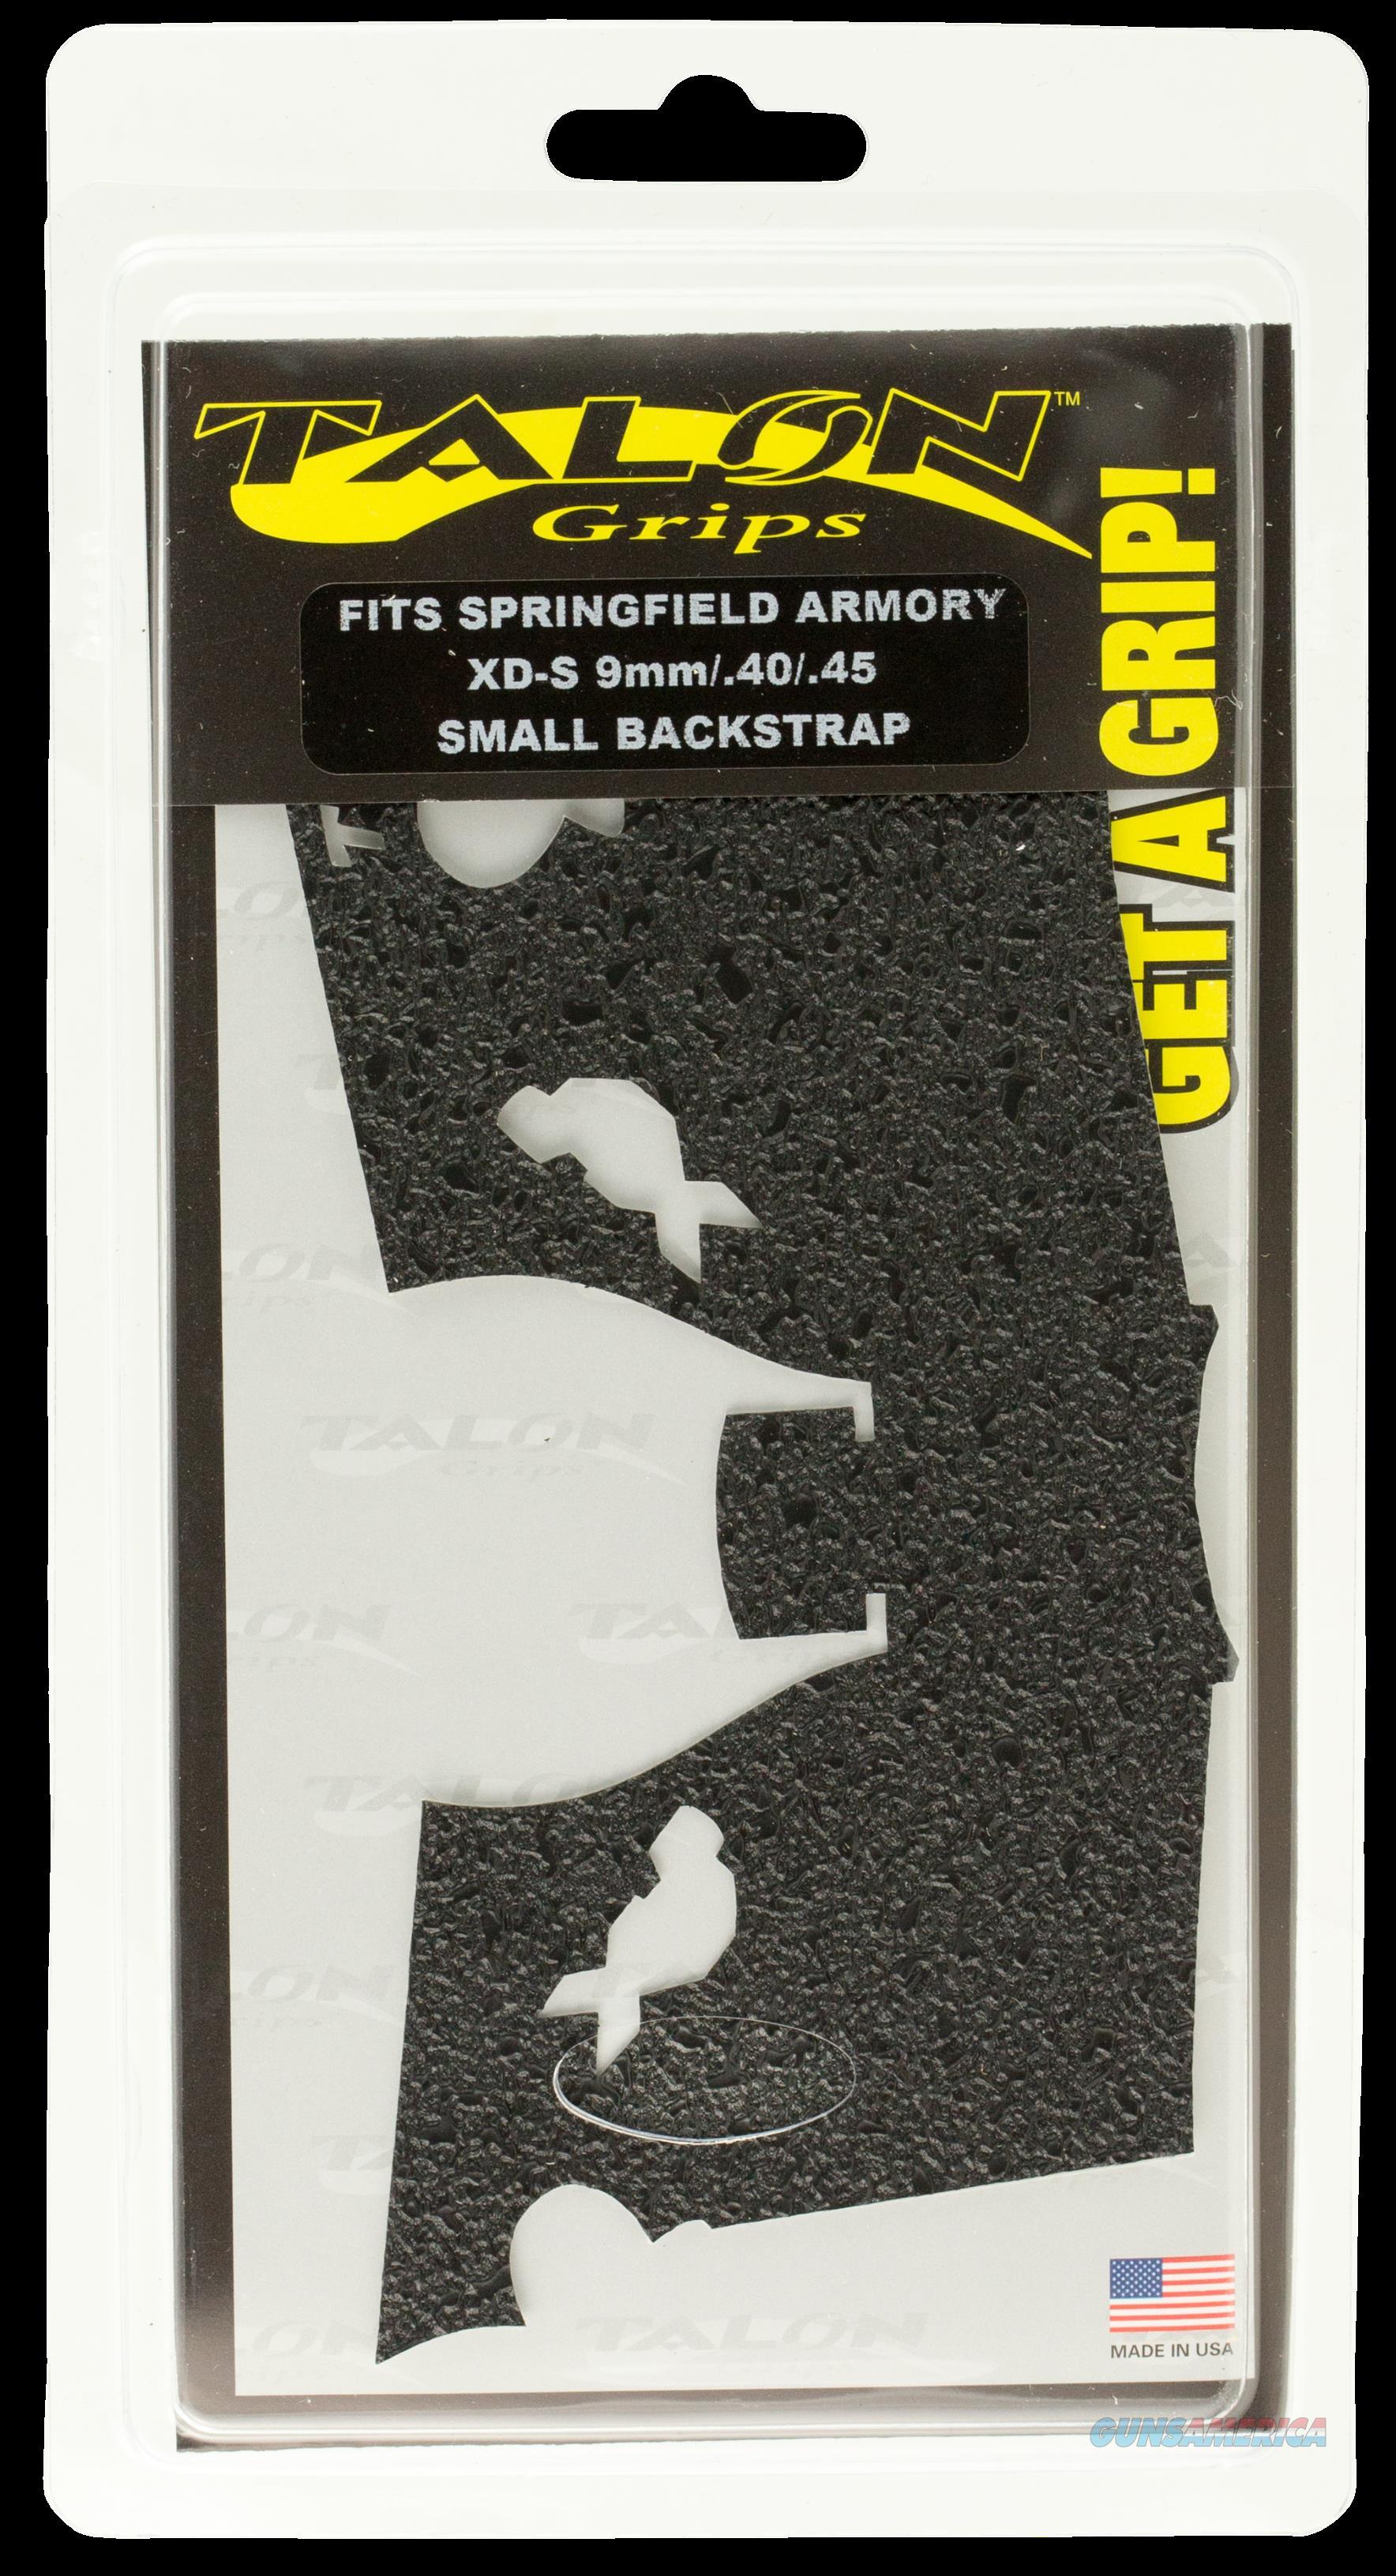 Talon Springfield Xd-s 9-40-45, Talon 207r Spg Xds      9-45 3.3  Rbbr  Guns > Pistols > 1911 Pistol Copies (non-Colt)